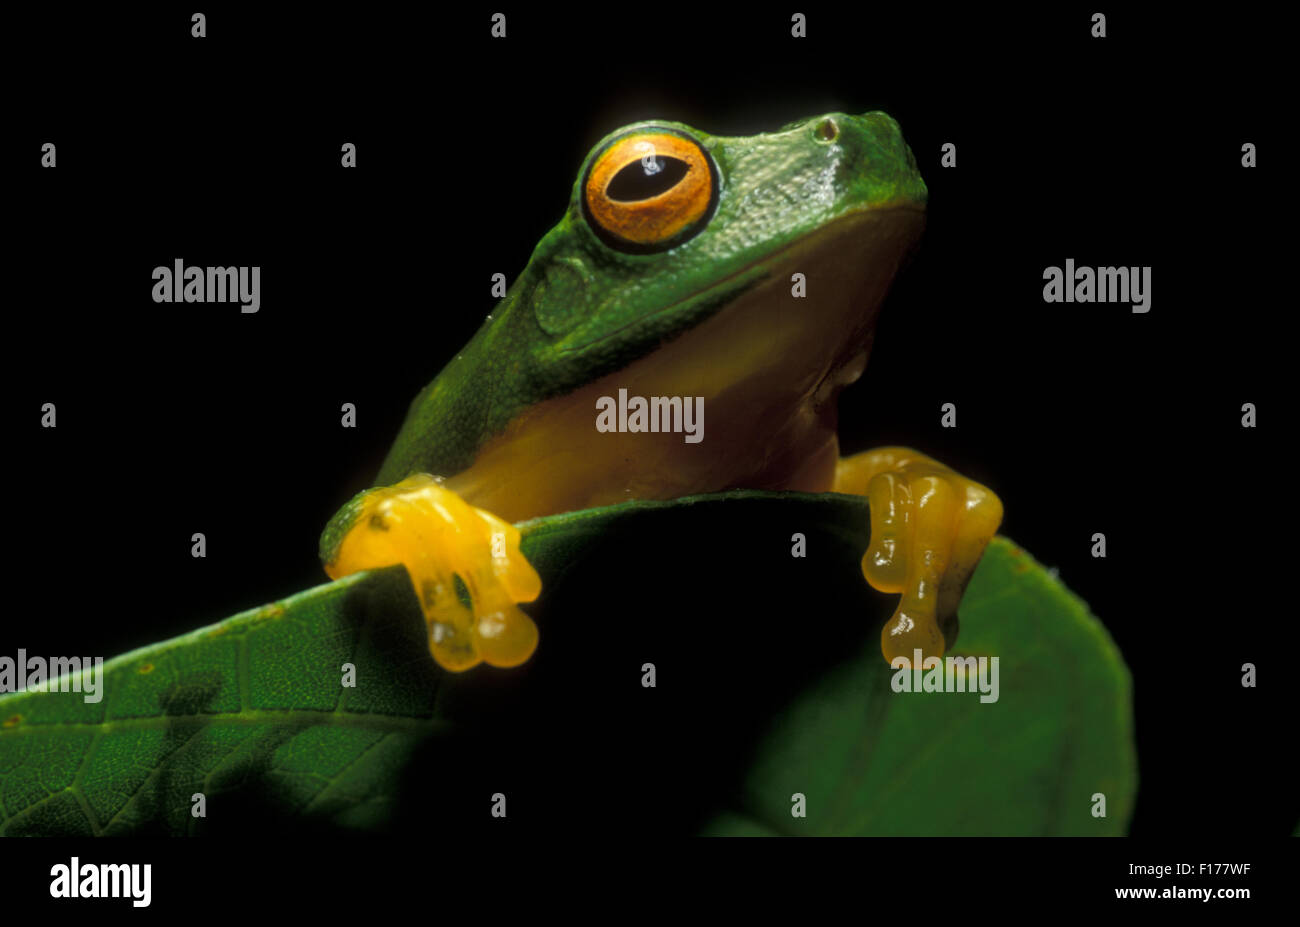 Australian Green tree frog (Litoria caerulea) - Stock Image